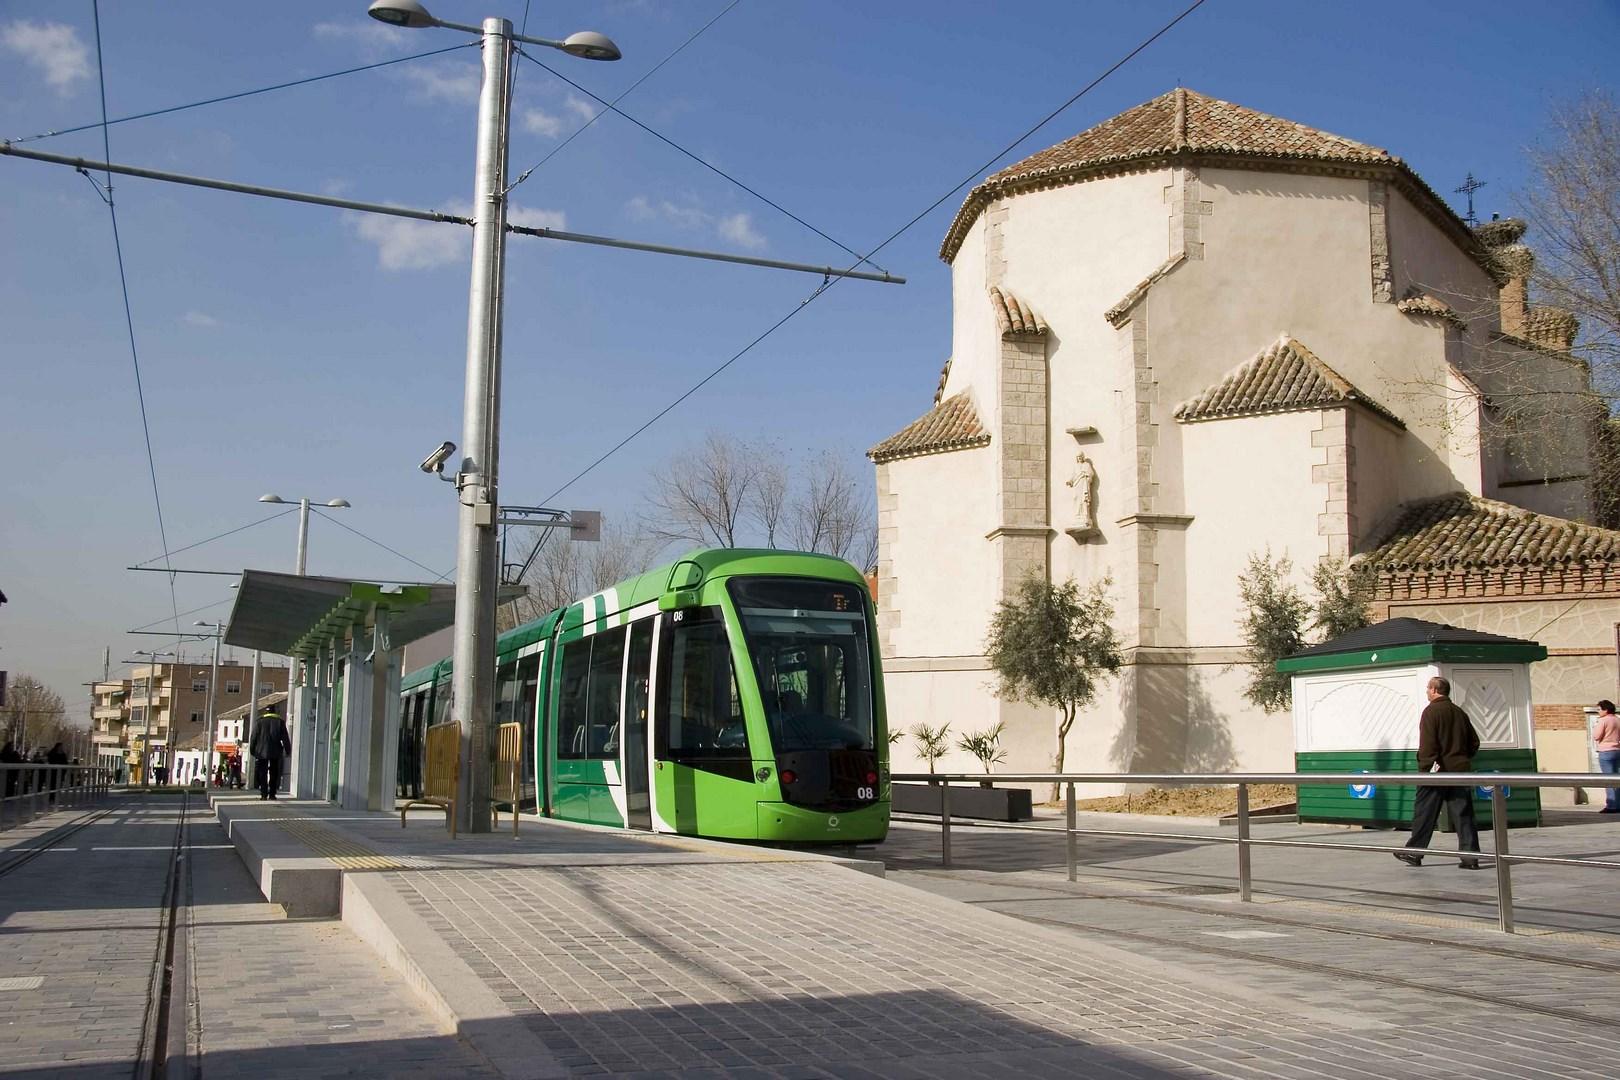 DECEMBER. Parla Tramway. Madrid